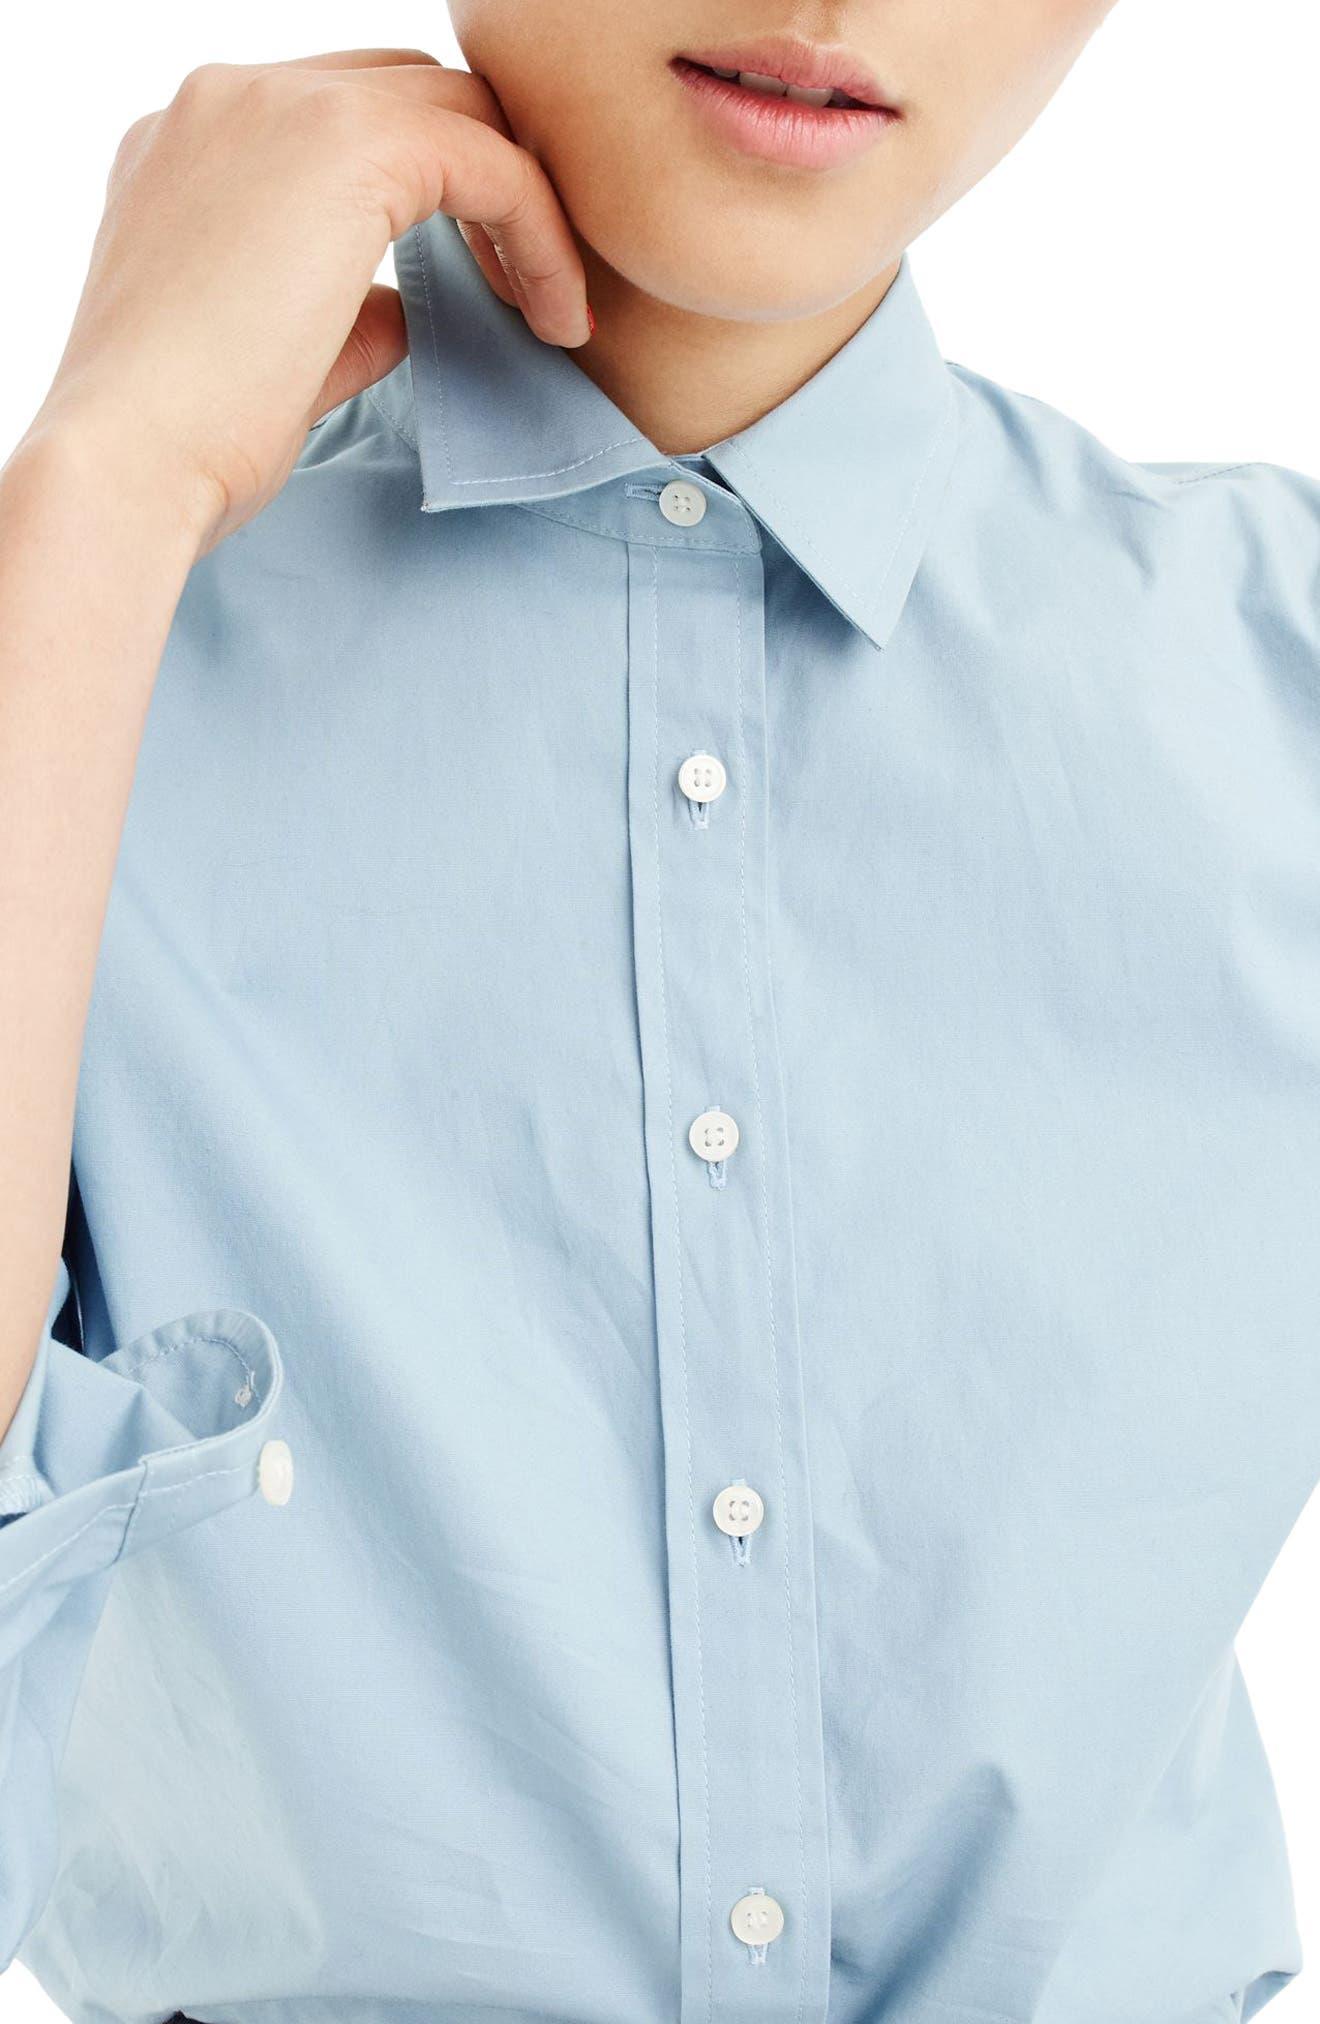 J.Crew Perfect Shirt,                             Main thumbnail 1, color,                             Misty Blue